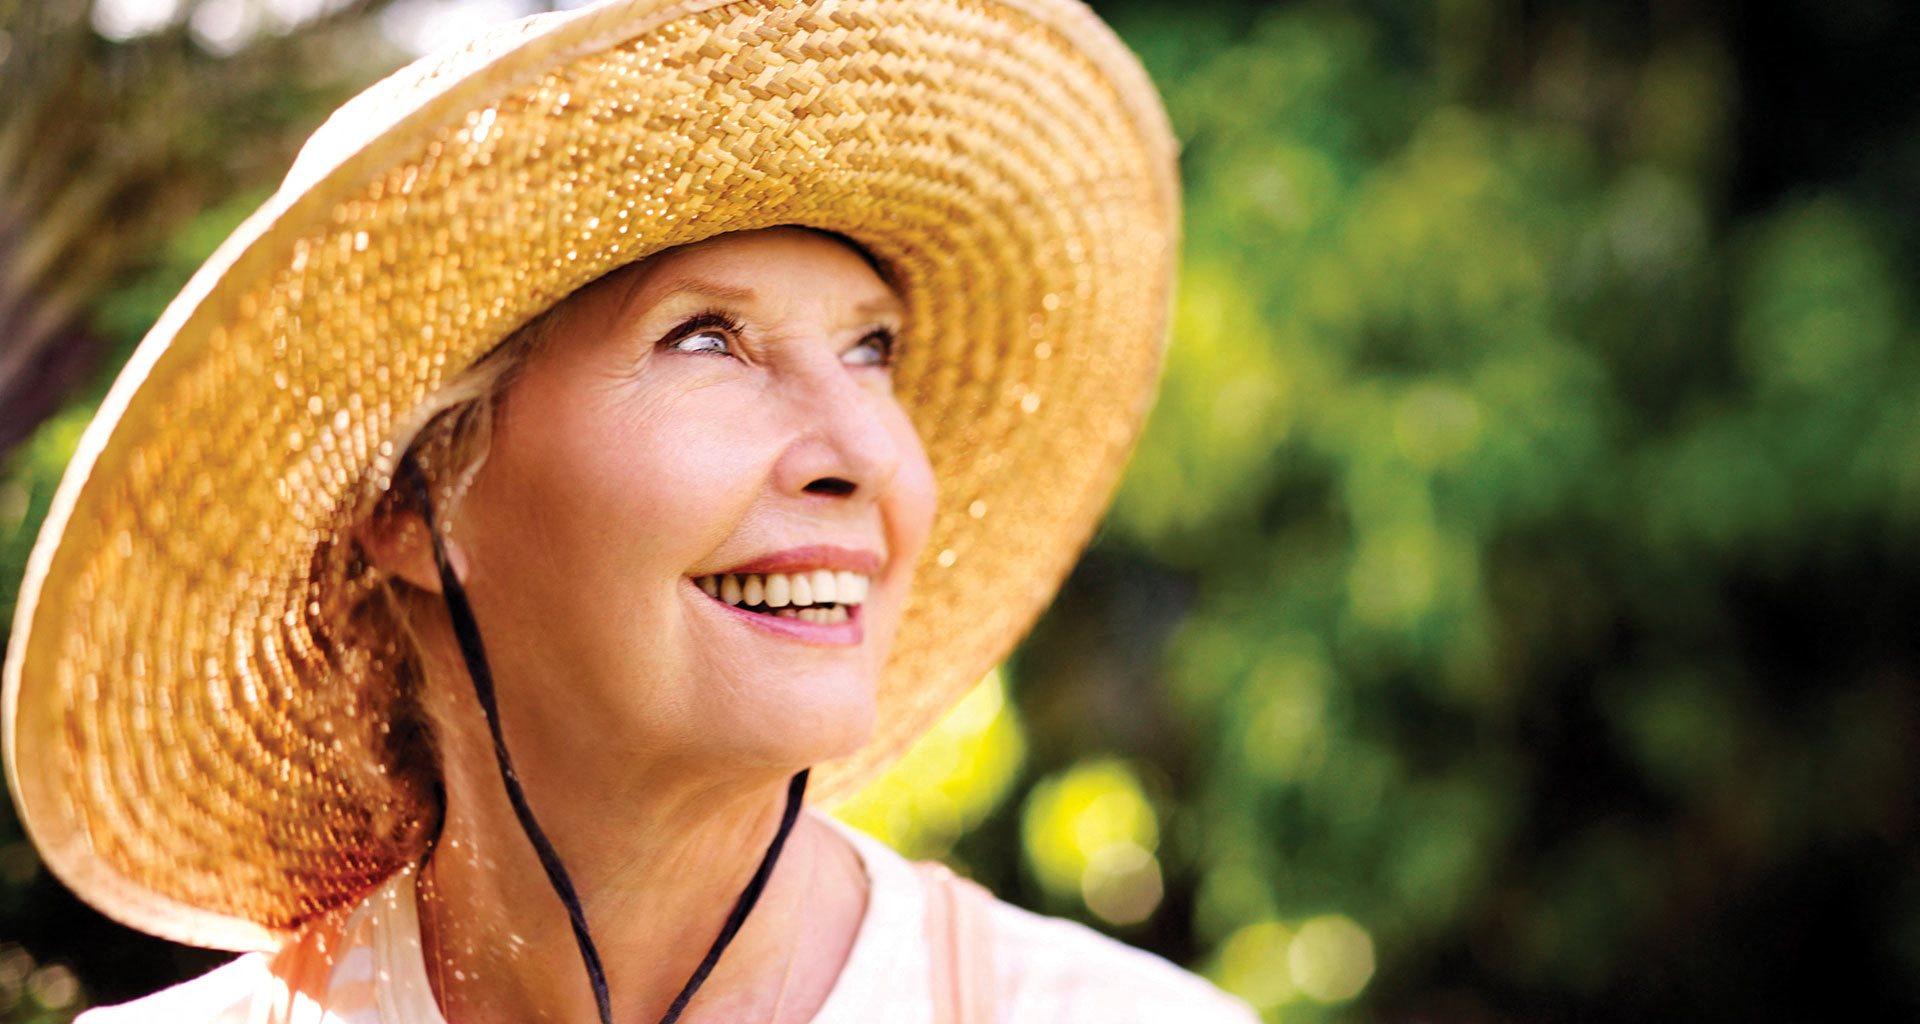 Old Lady Wearing Hat at Meridian at Laguna Hills, California, 92653,at Meridian at Laguna Hills, California